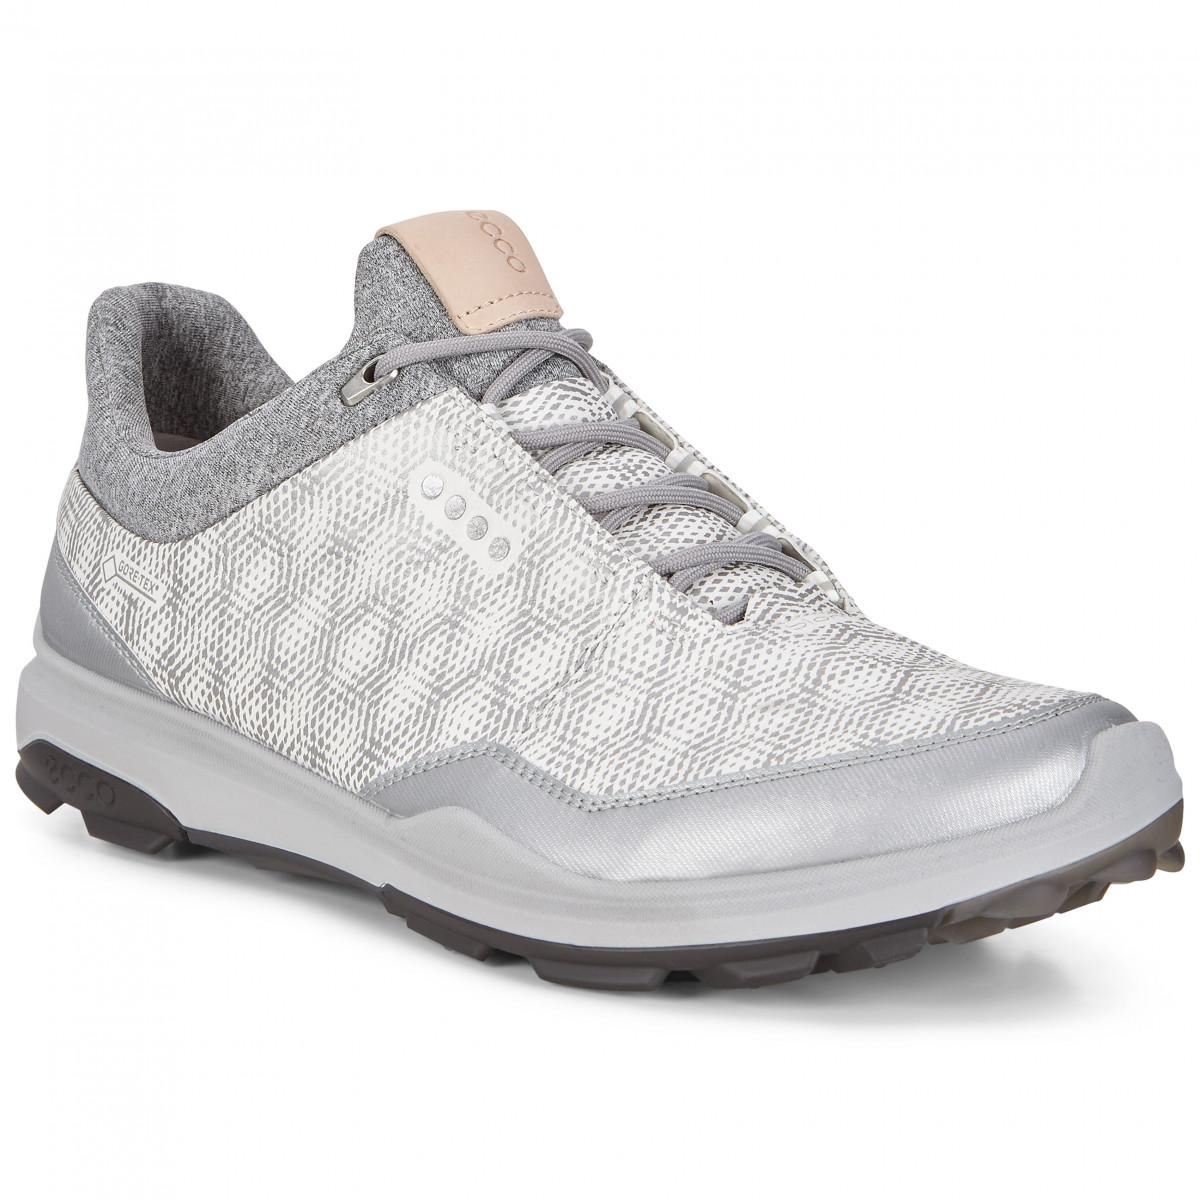 3a24ca2cb0 Ecco Mens 2019 M Golf Biom Hybrid 3 Gore-Tex Waterproof Shoes